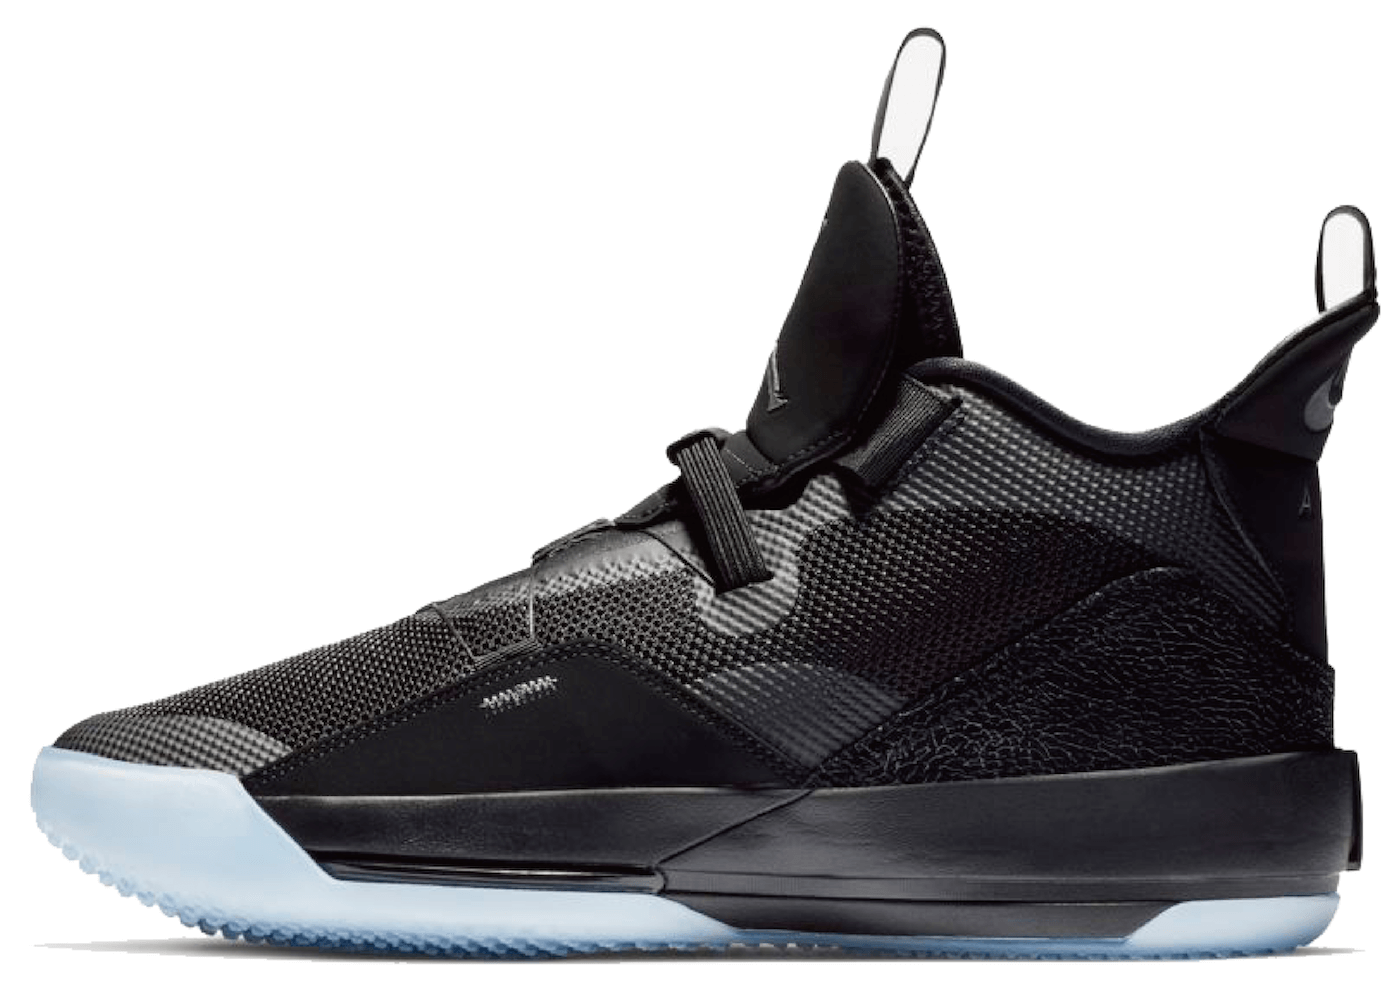 Nike Air Jordan 33 Blackoutの写真